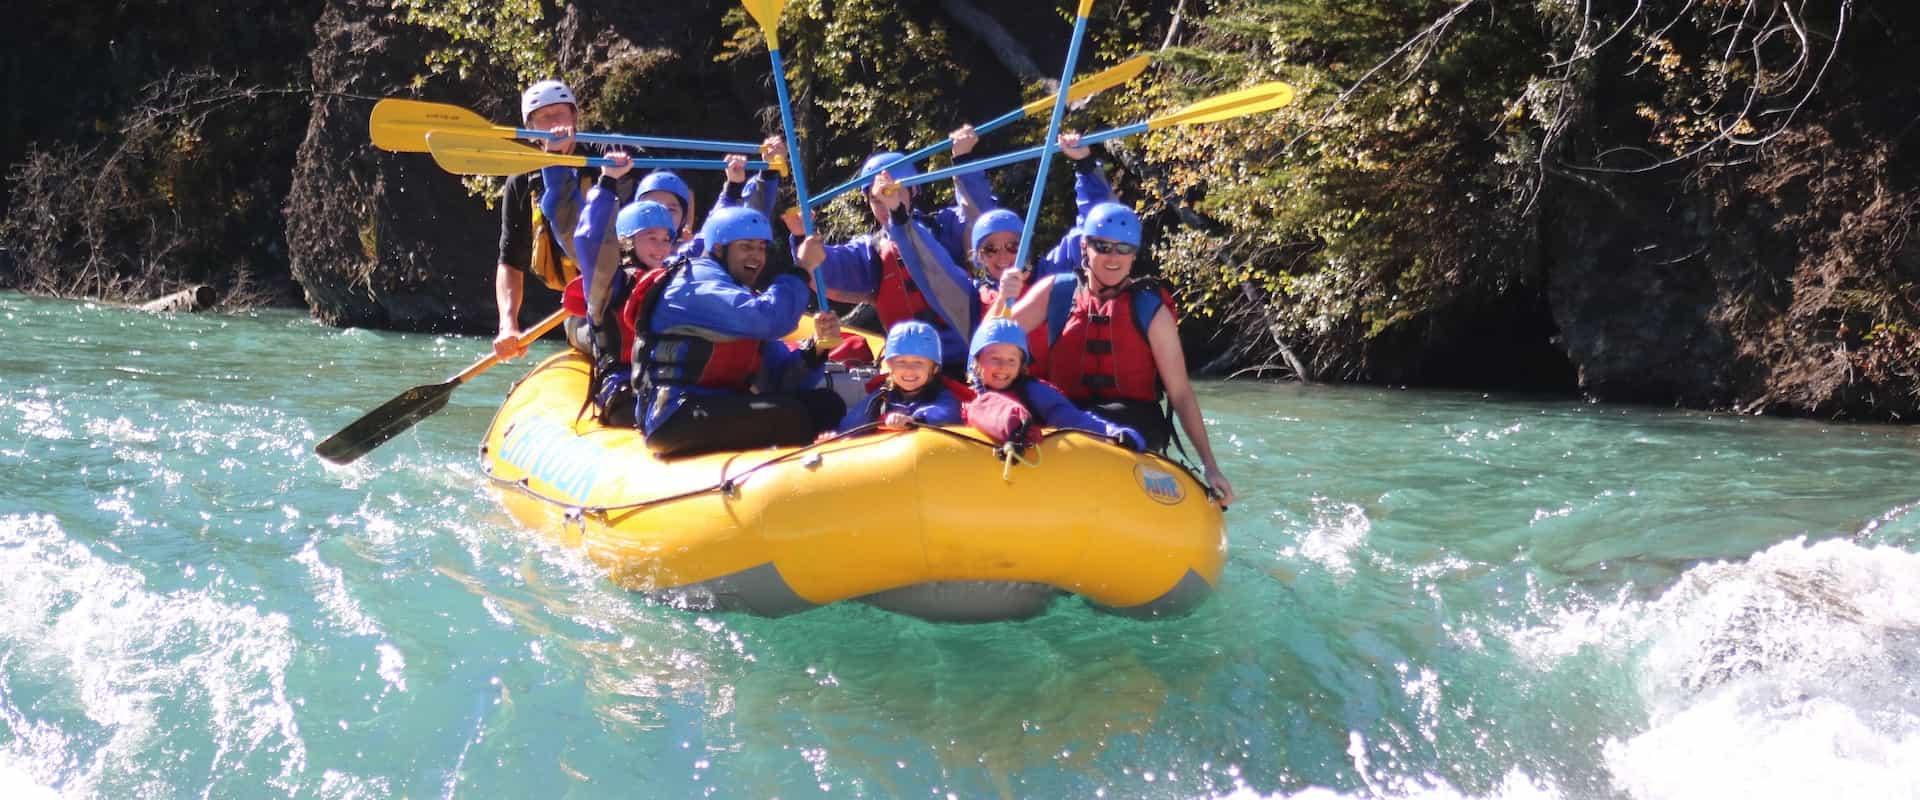 Save 20% on Spring Whitewater Rafting